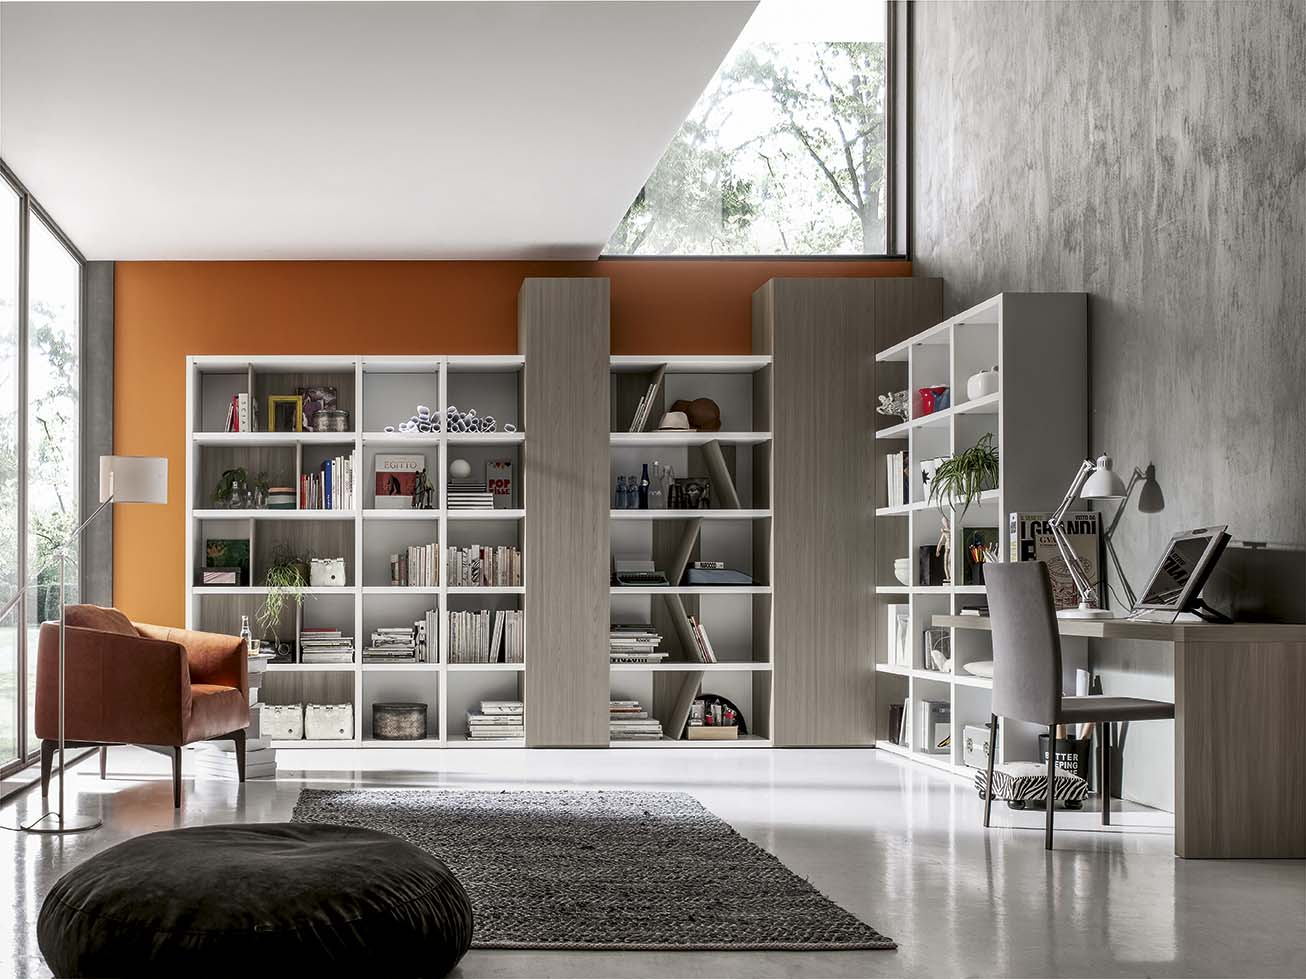 Soggiorni Stile Moderno : Stile moderno ab mobili